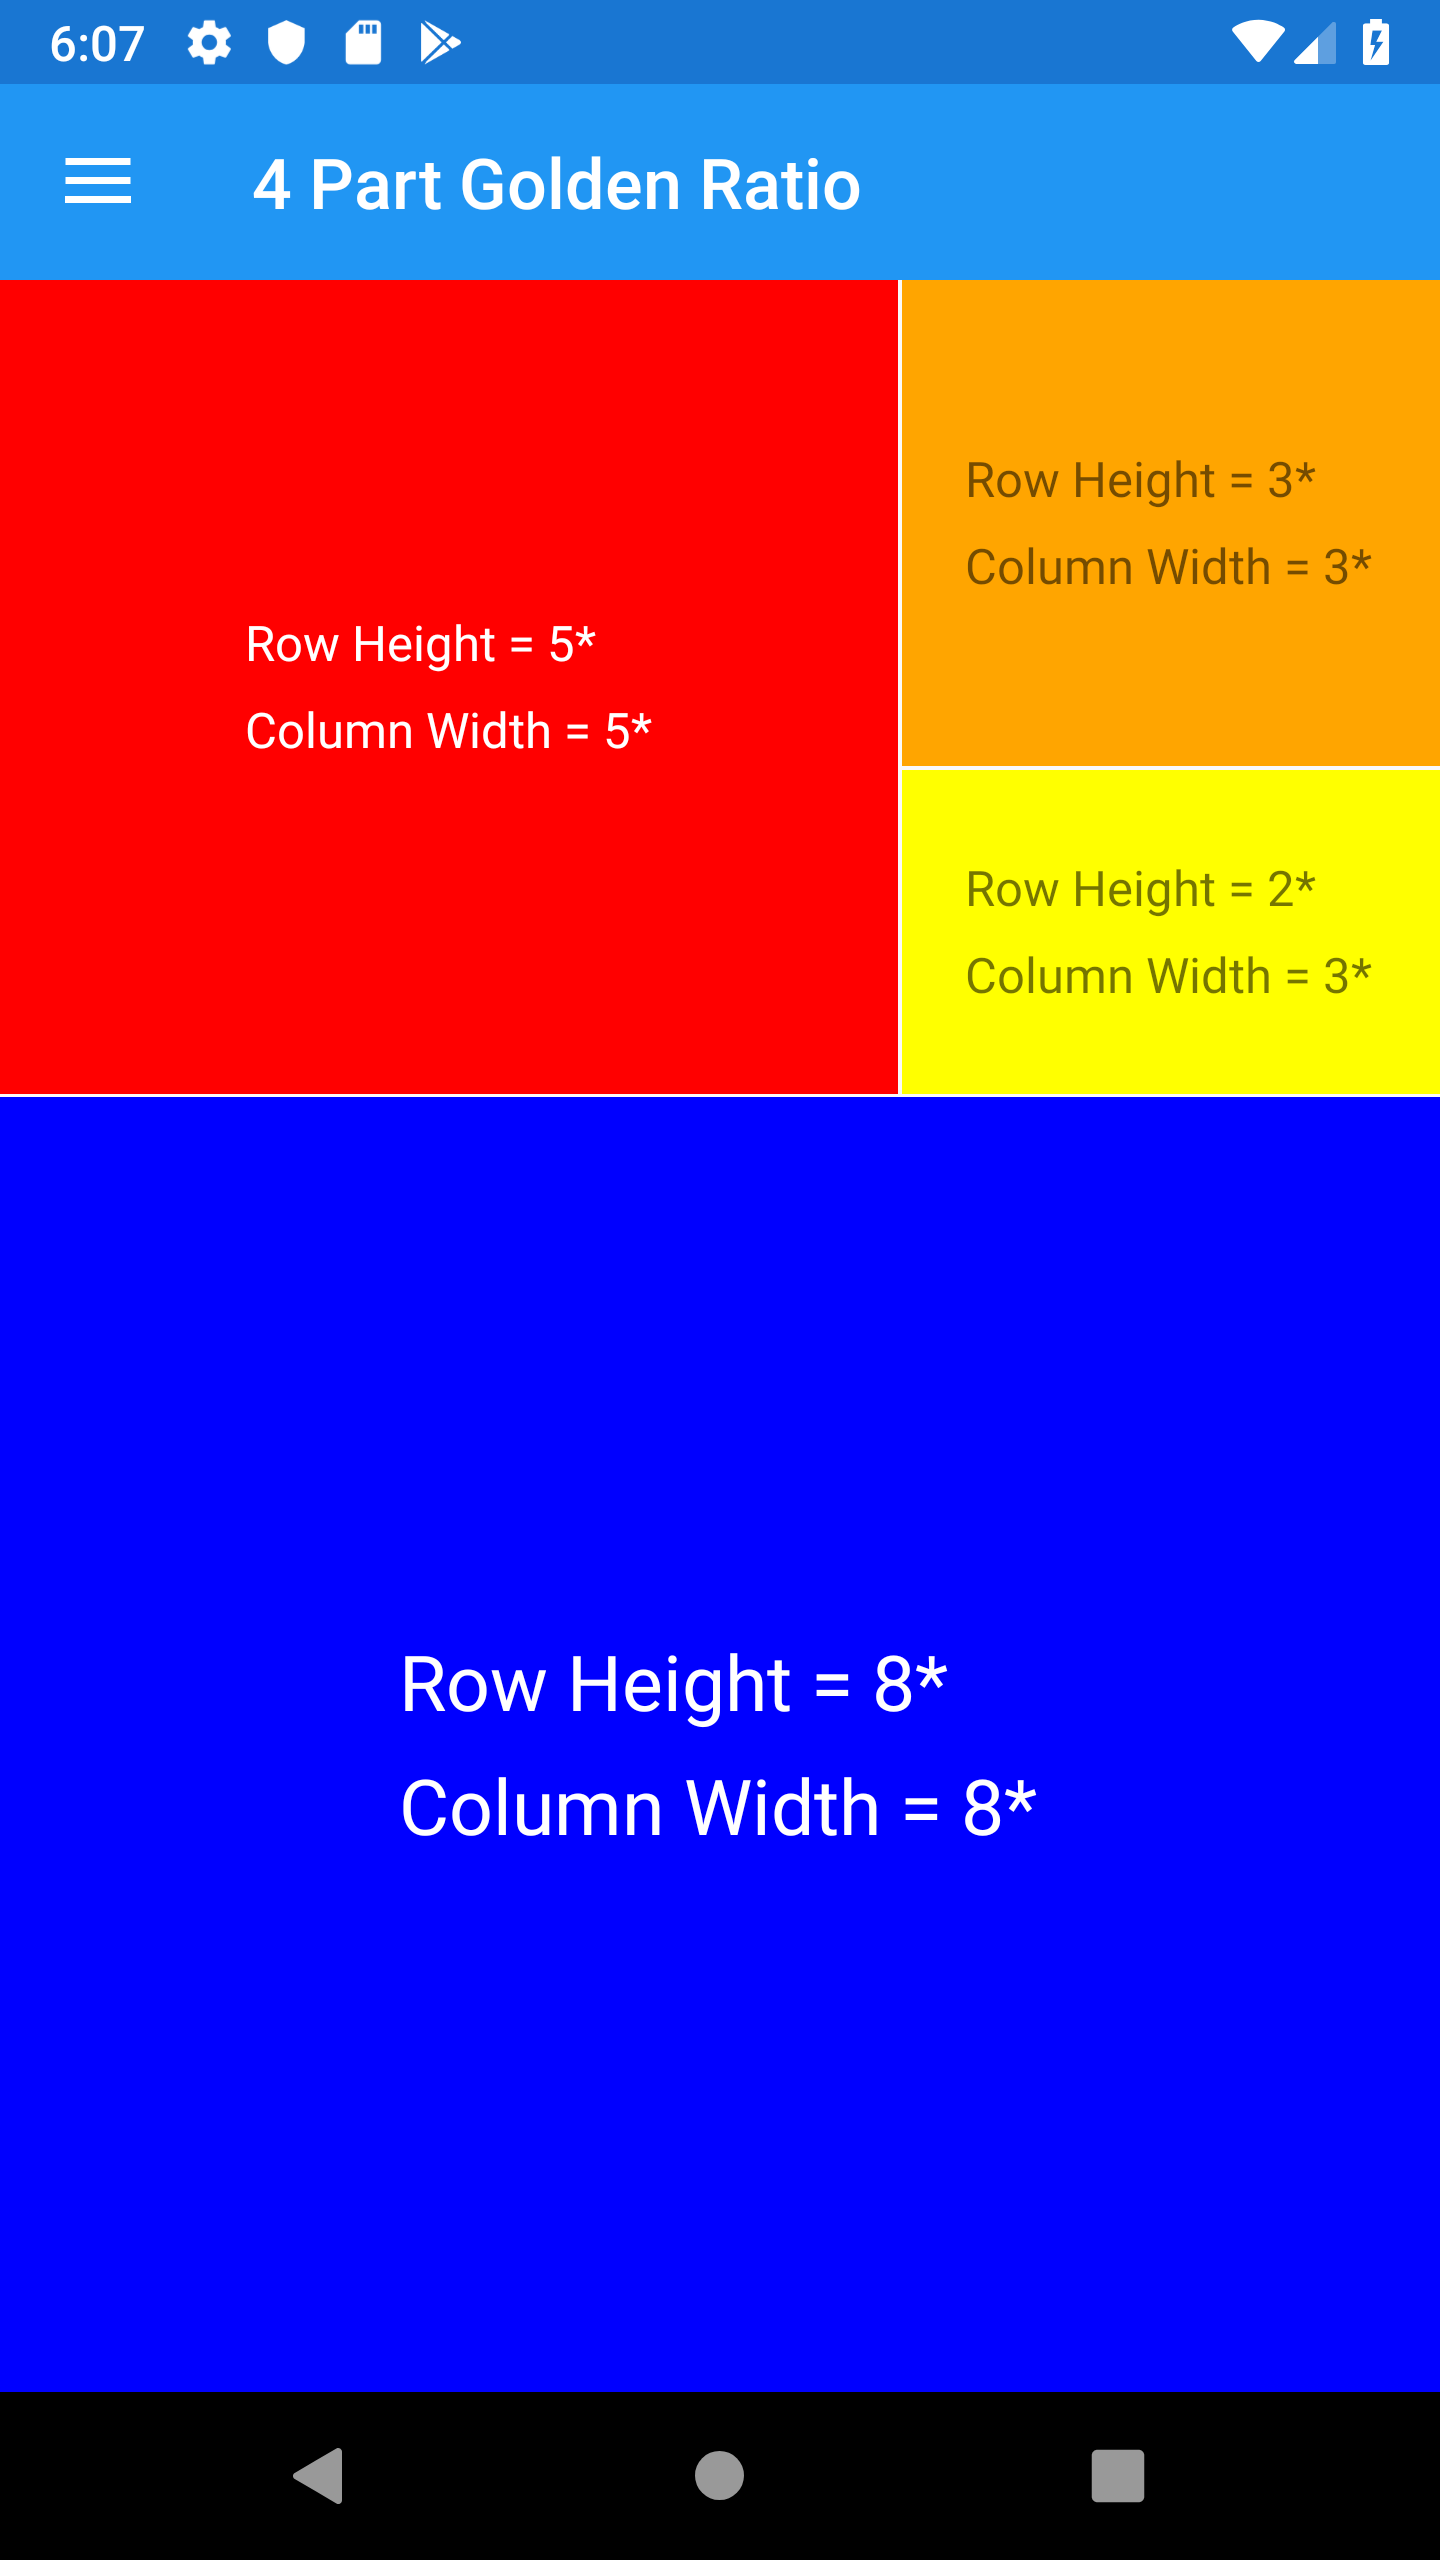 Golden Ratio 4 Parts